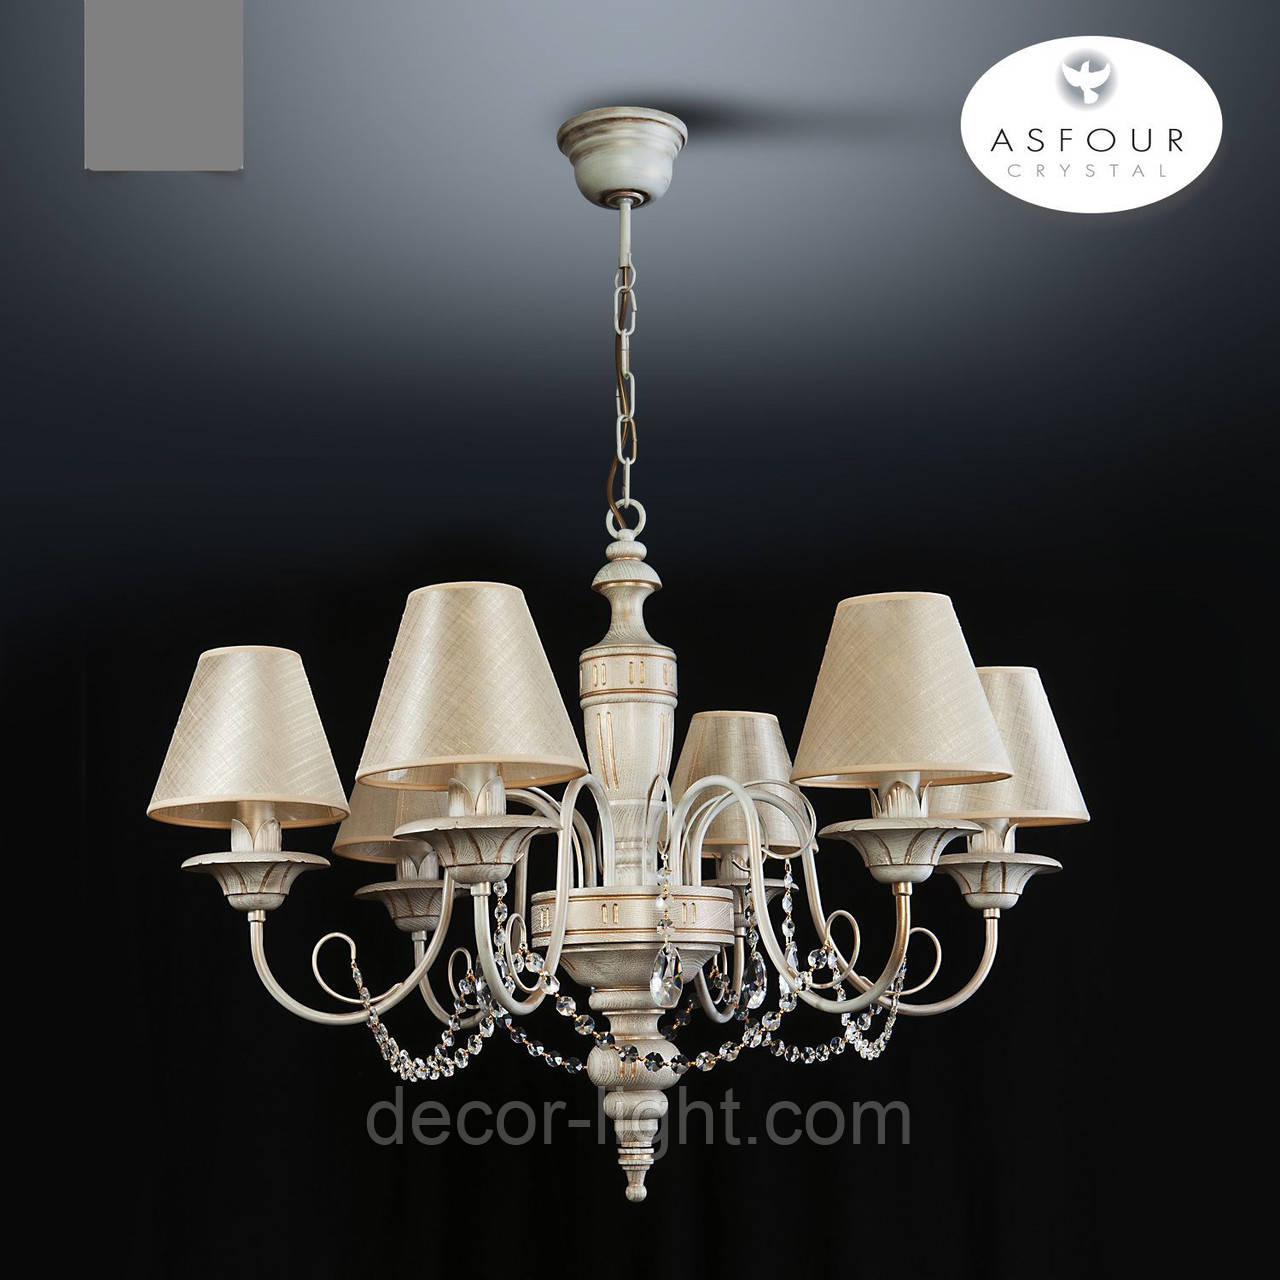 Люстра 6-ти ламповая с хрусталем для спальни, для зала  18006-2